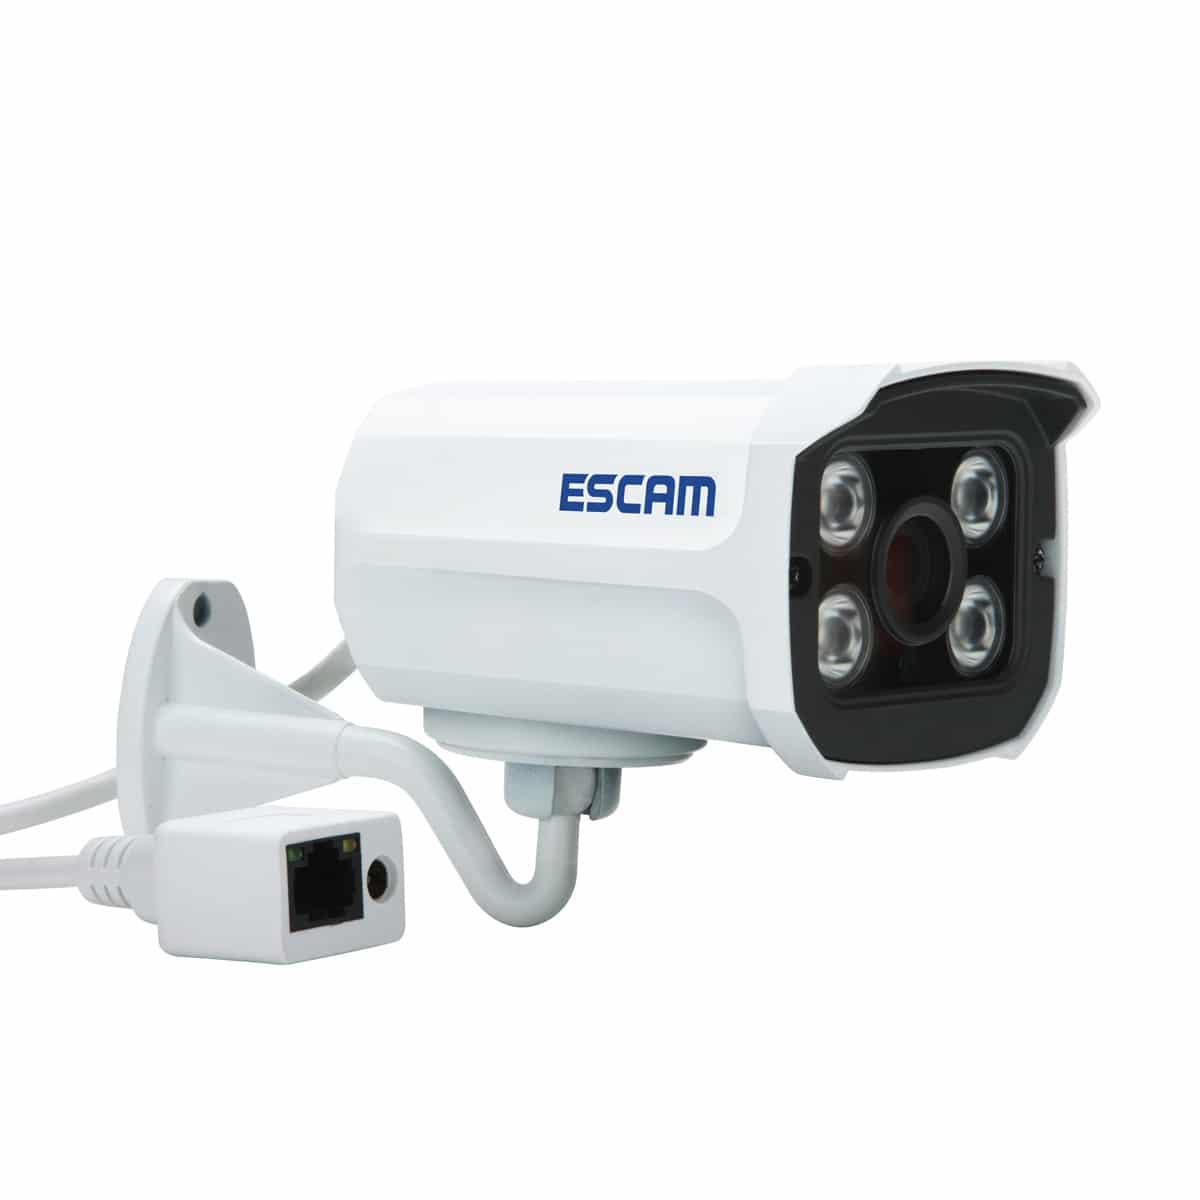 Escam Ip Camera QD300-02